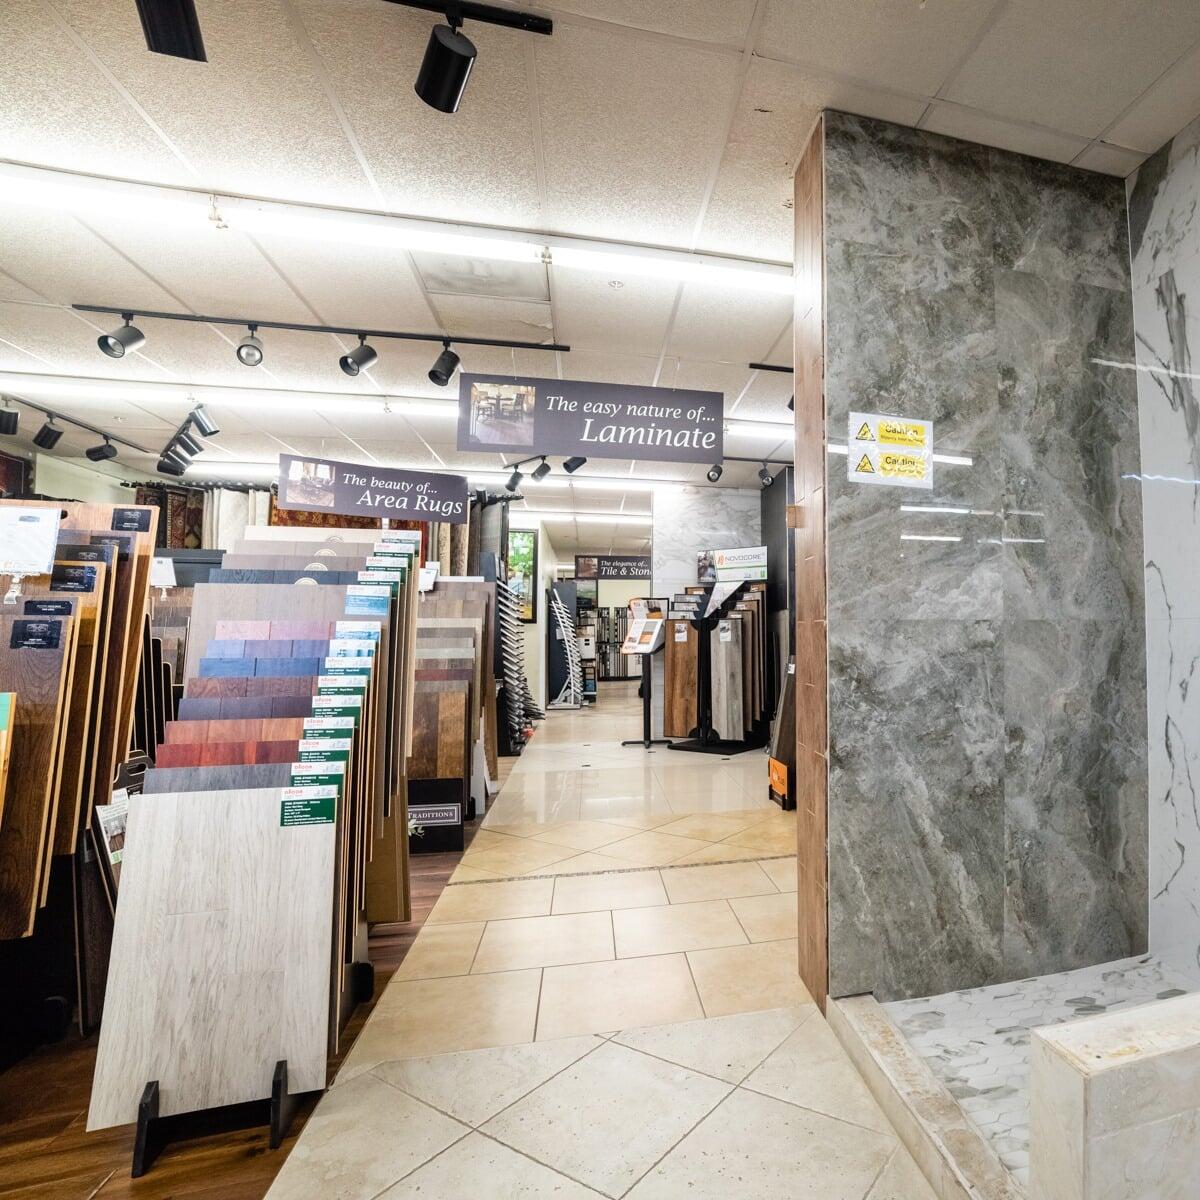 Laminate in Rosenberg, TX from the Colony Flooring & Design Inc showroom